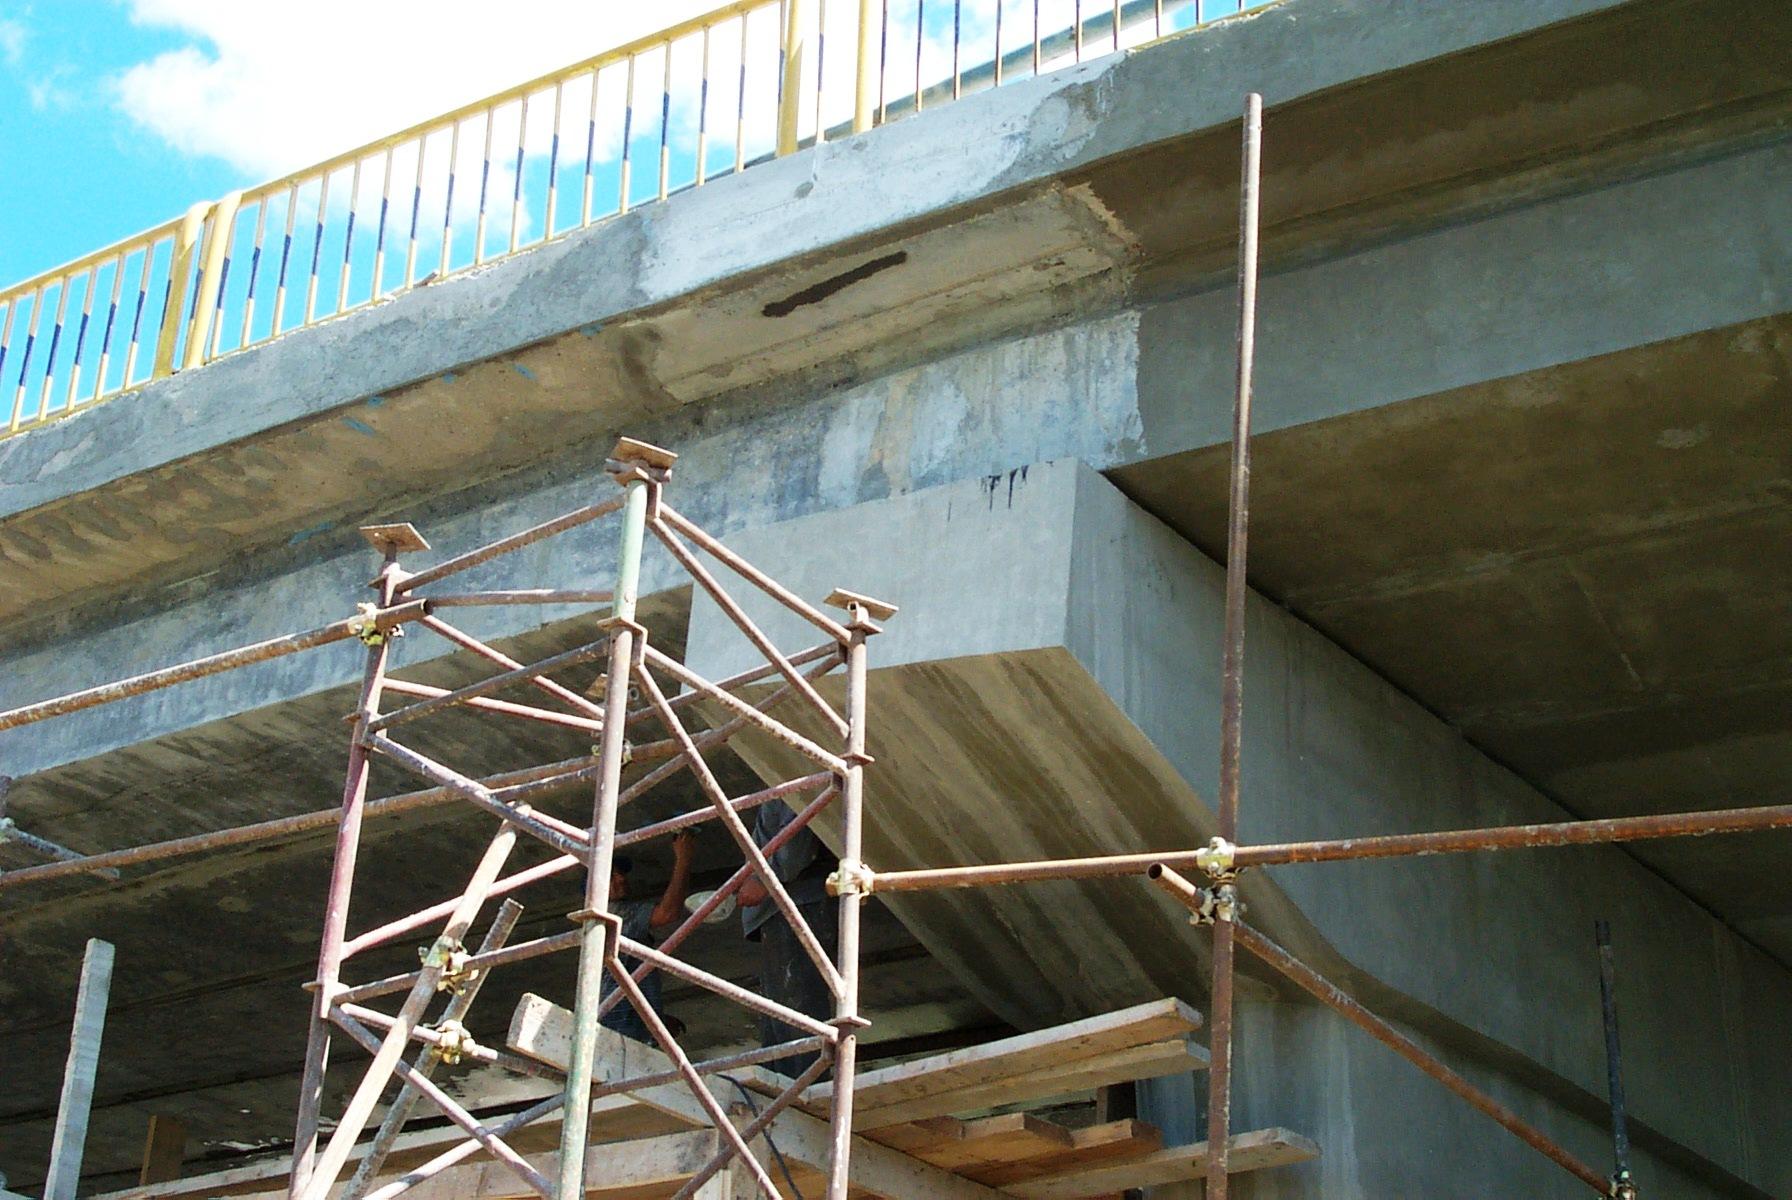 Reparatii pod (DN2), Km. 33 - 028, peste raul Calnistea MAPEI - Poza 112